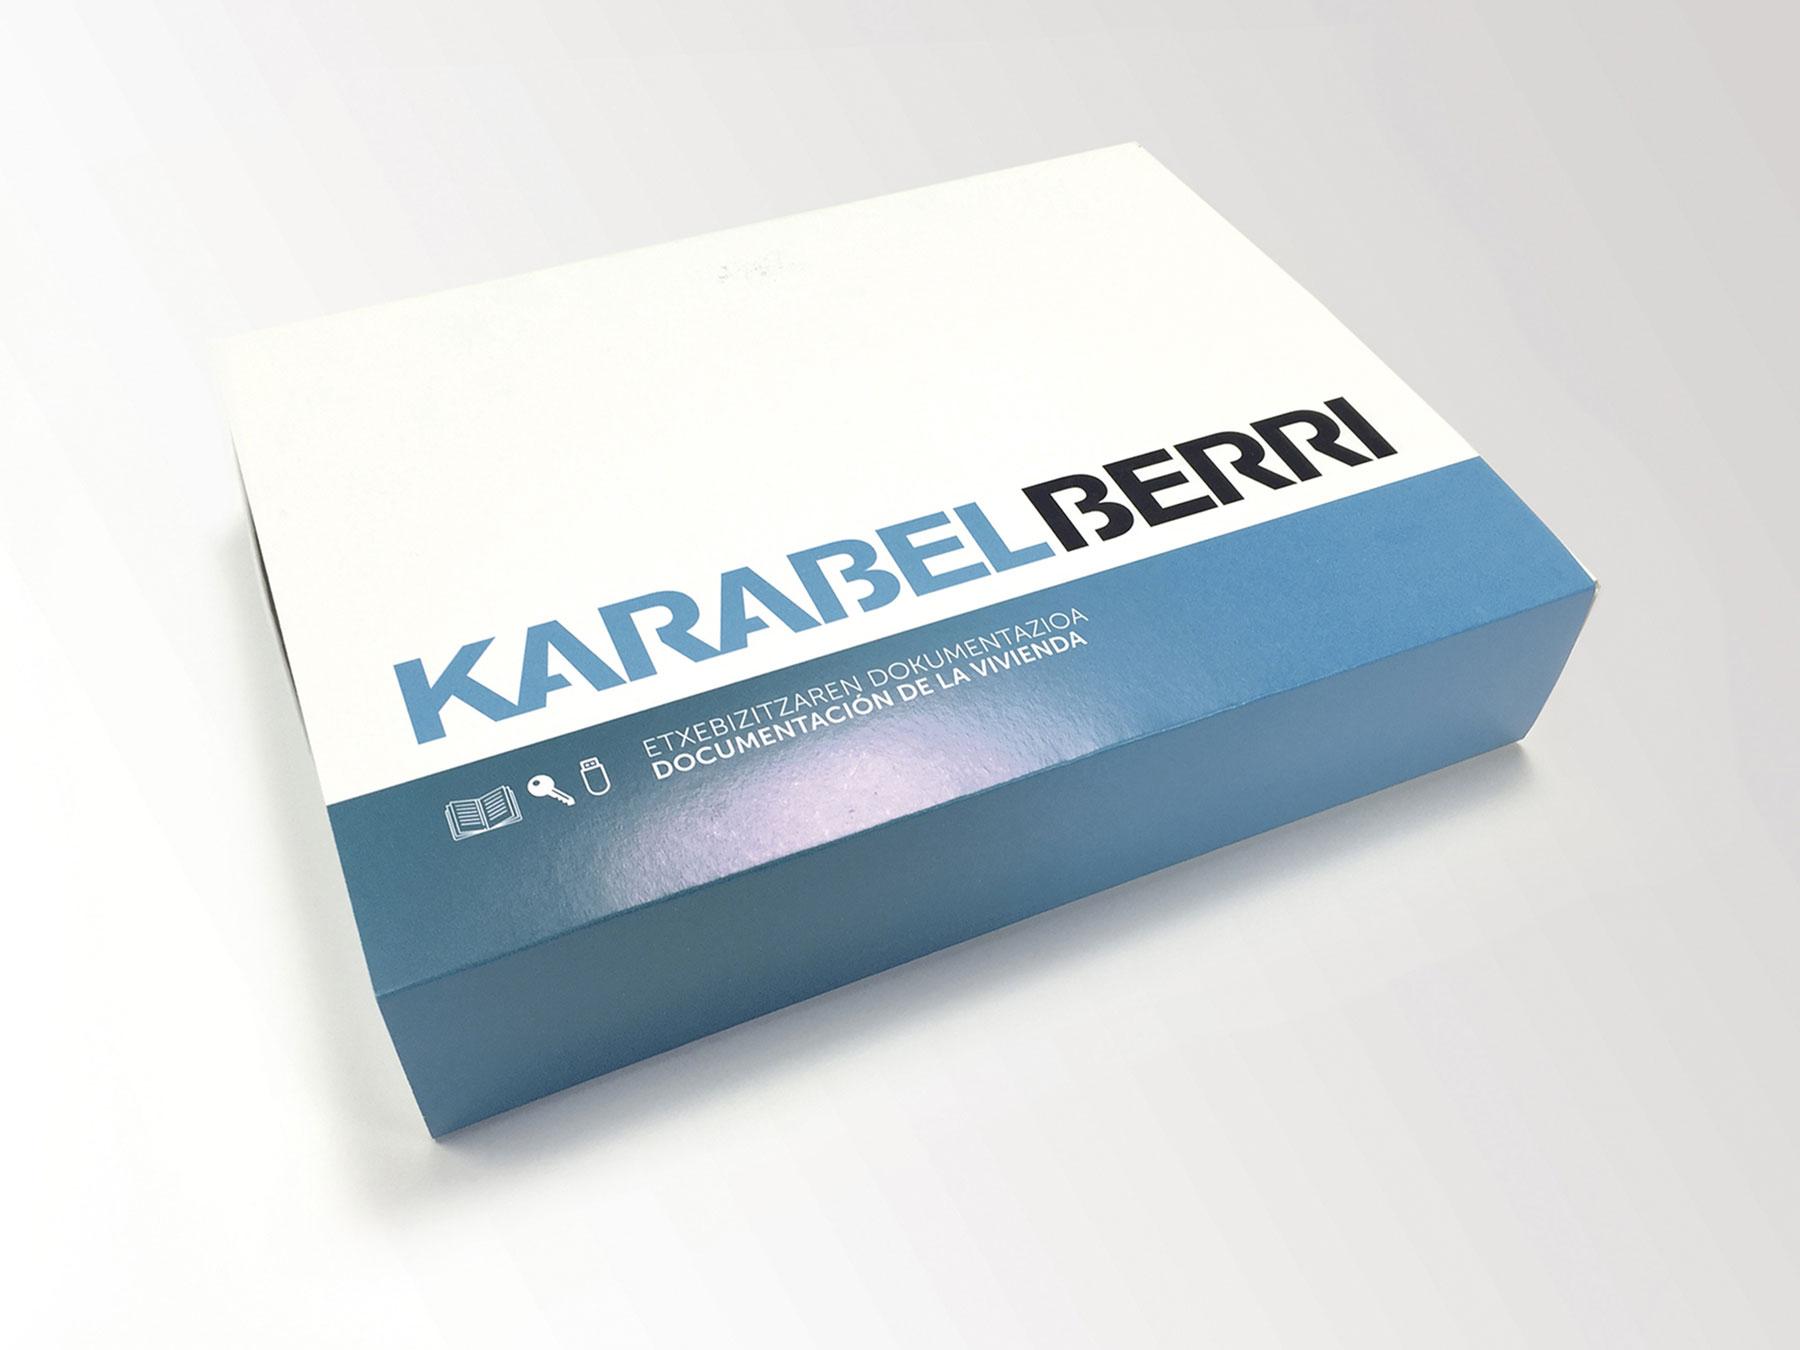 Kit vivienda caja Karabel Berri